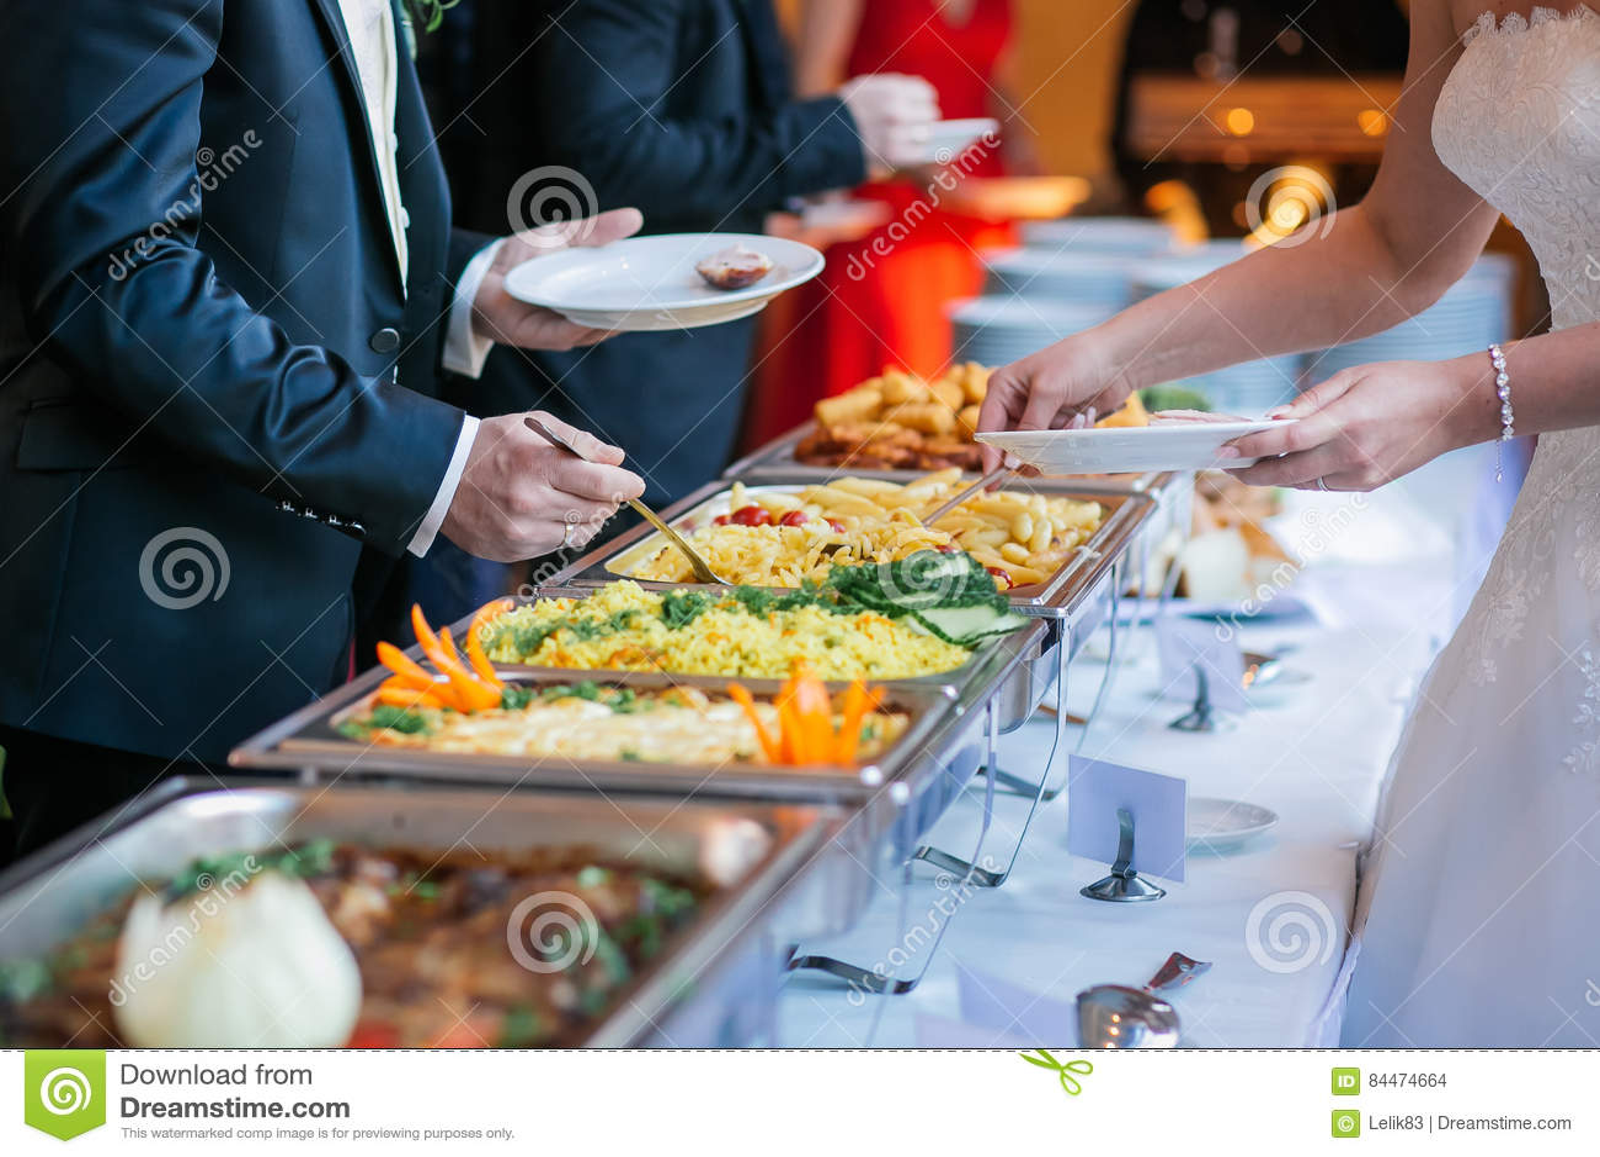 Verpflegungslebensmittel-Hochzeitsbuffet